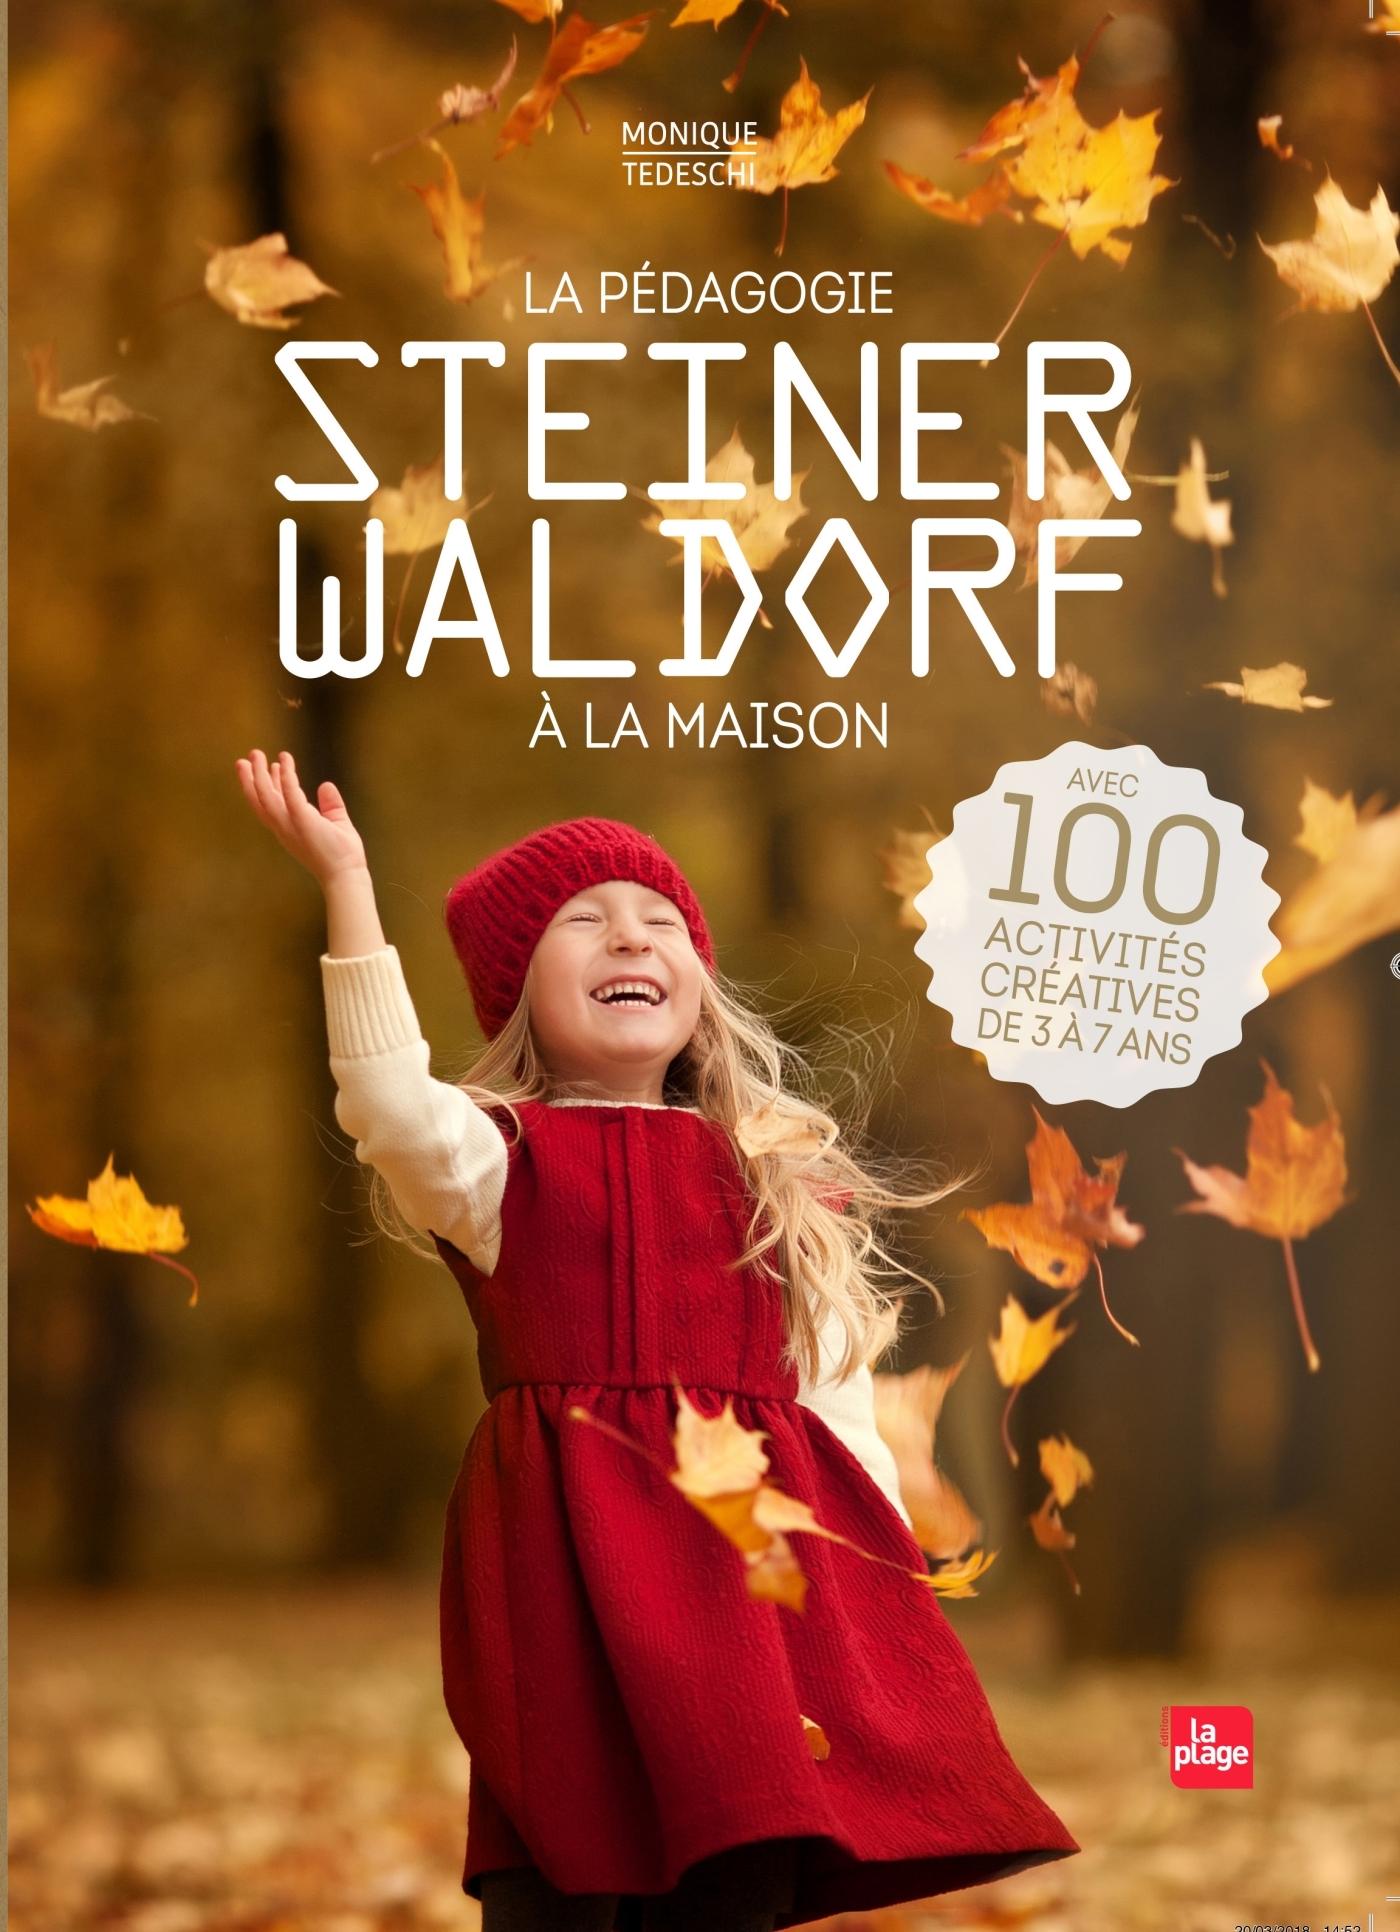 LA PEDAGOGIE STEINER-WALDORF A LA MAISON